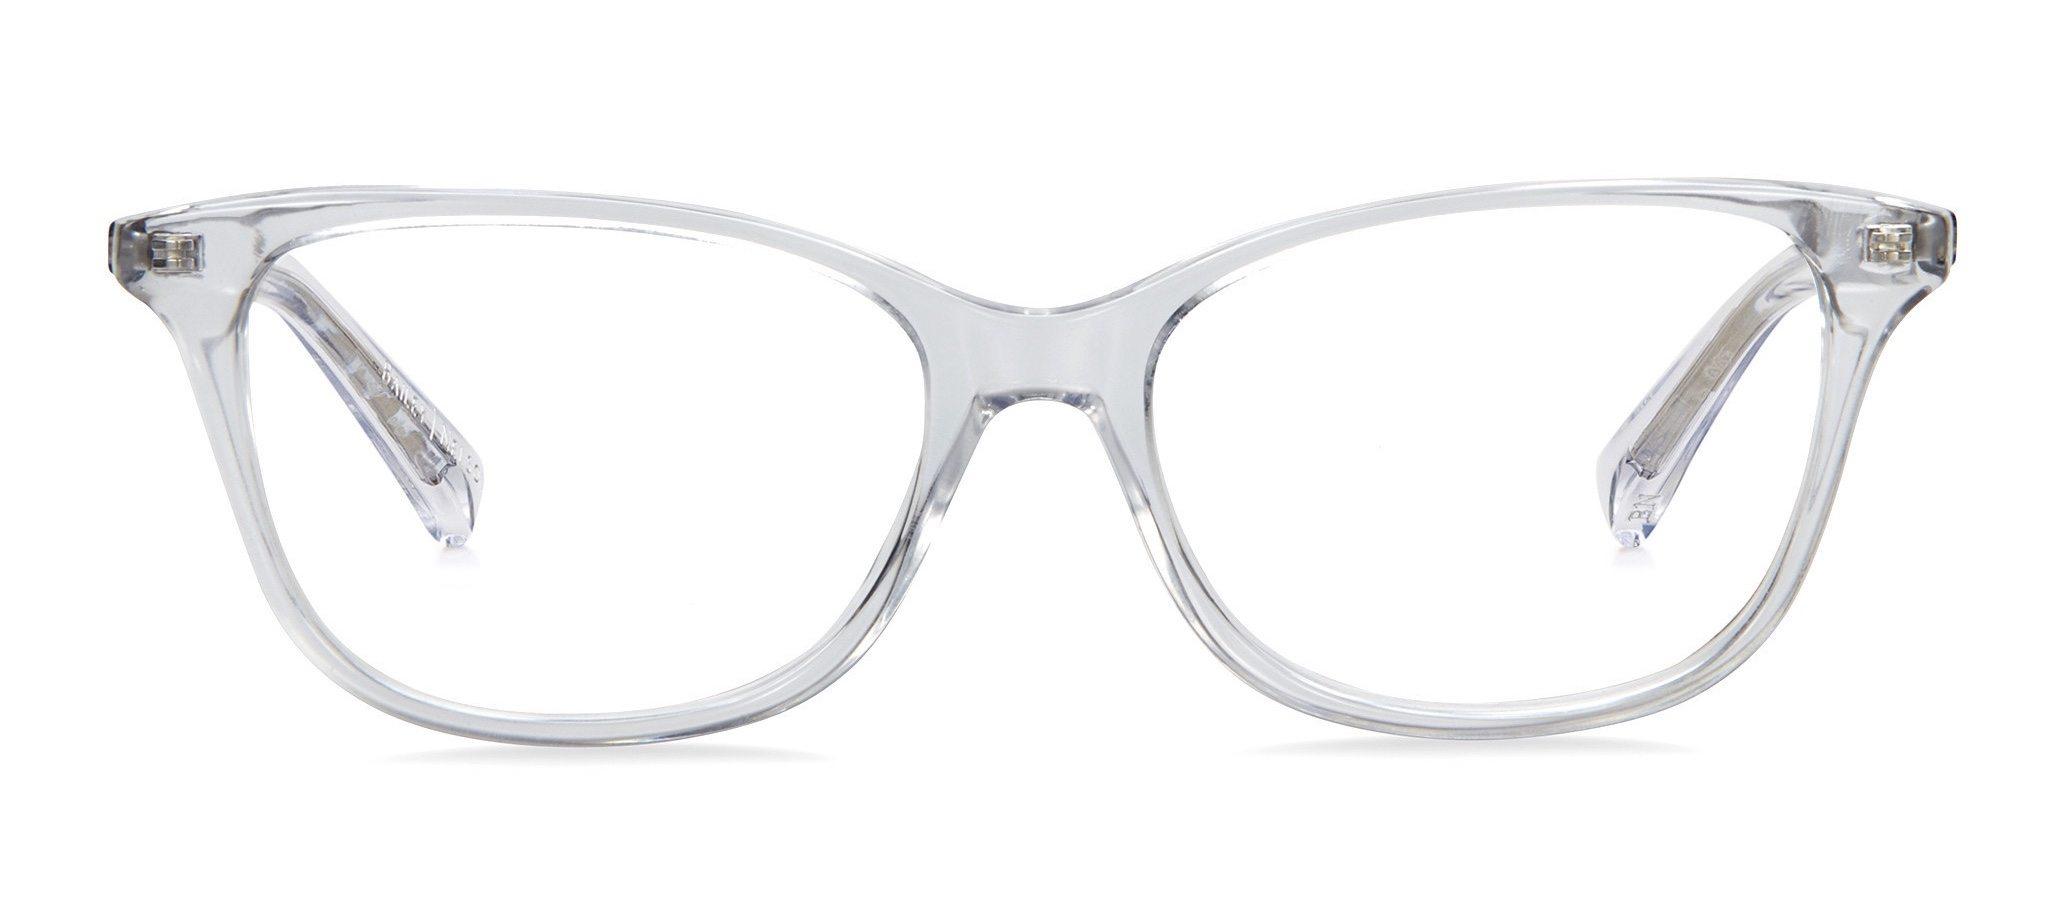 glasses new